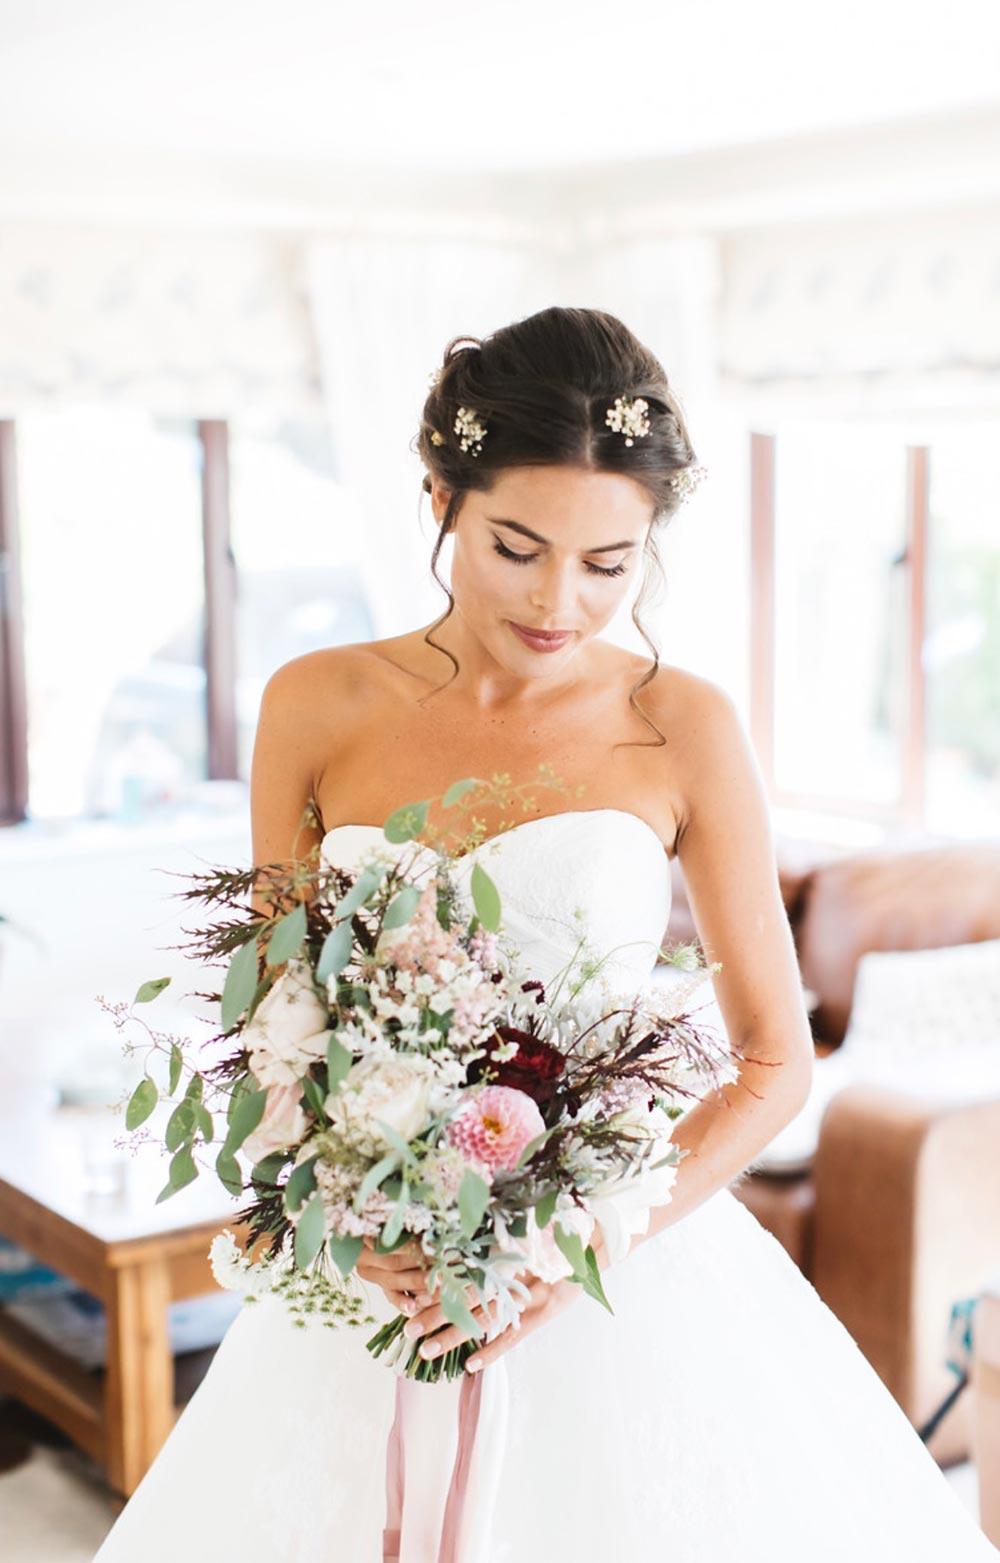 25-wilde-thyme-wedding-event-flowers-bridal-bouquet-garden-roses-seasonal-flowers-wedding-flower.jpg